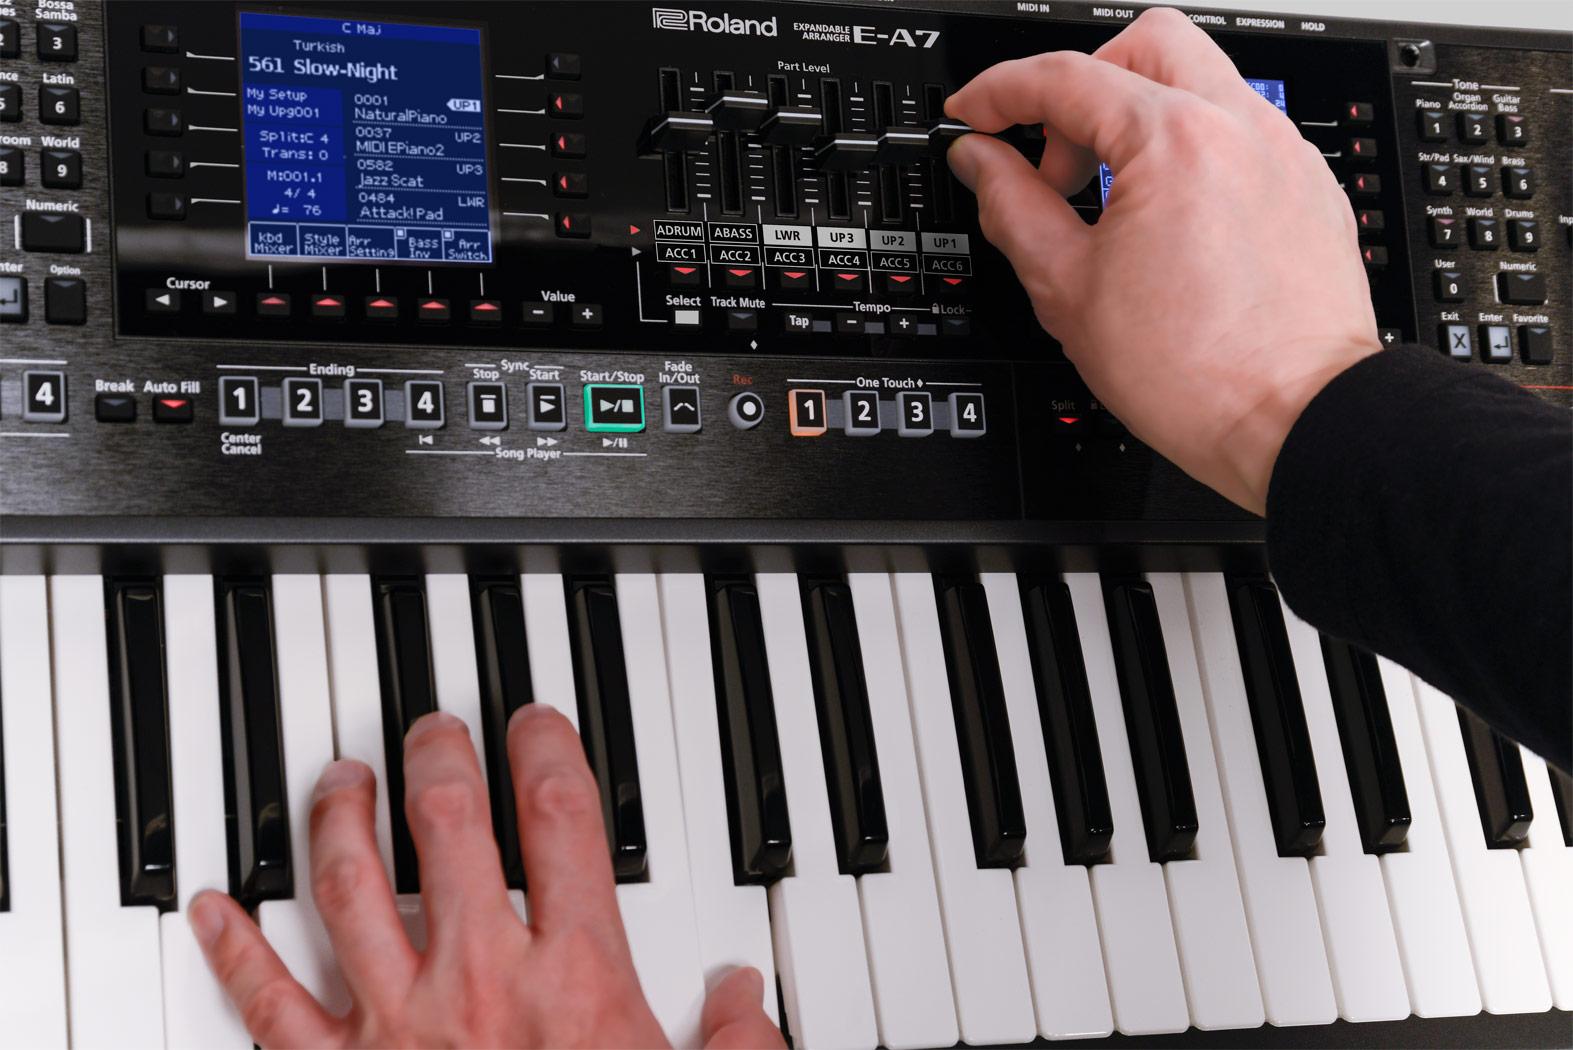 Organ-Roland E-A7-Expandable-Arranger-Keyboard-Quick-Edit